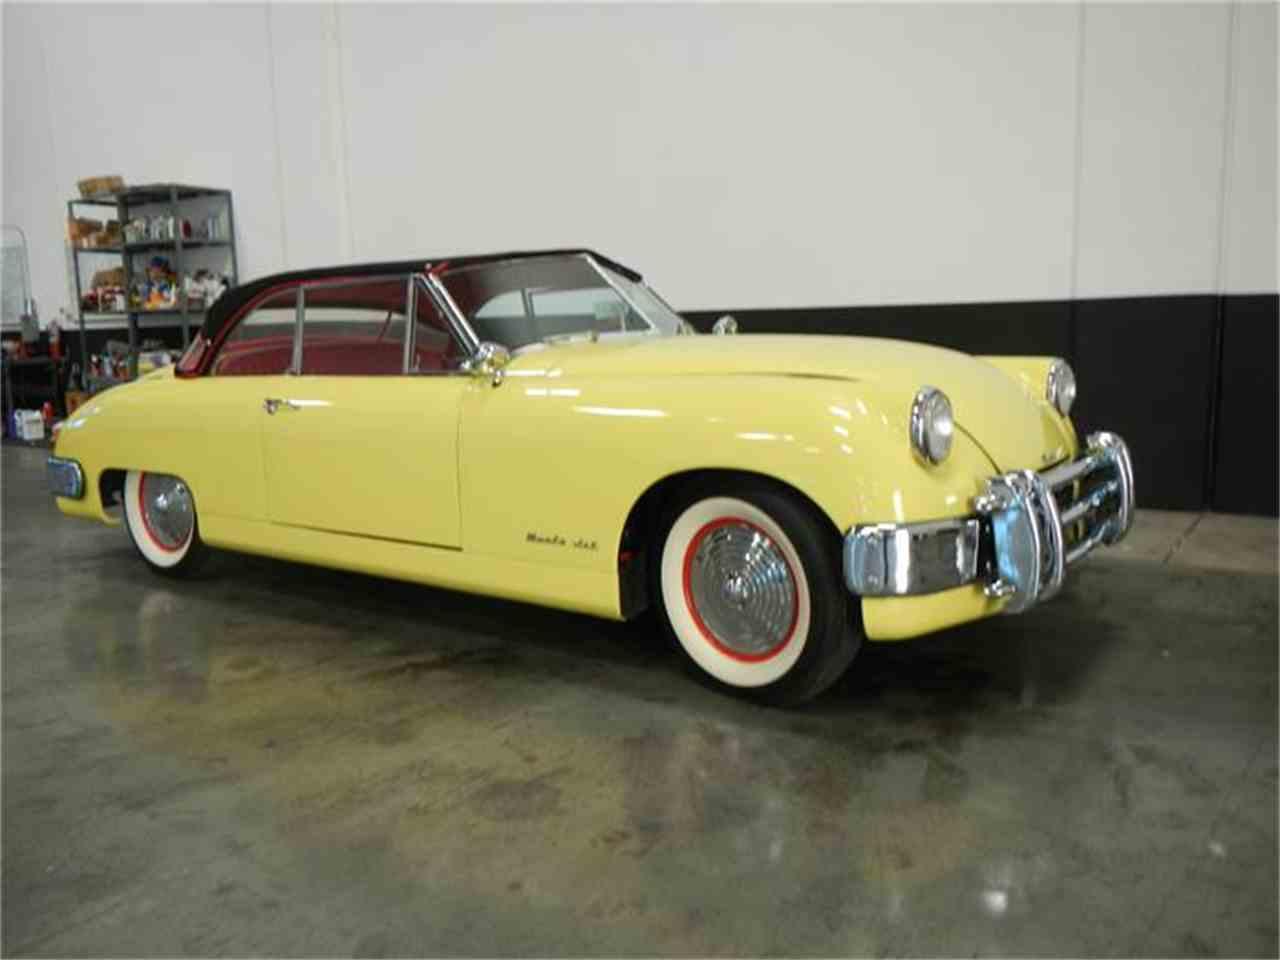 Classic Cars For Sale California Usa: 1953 Muntz Jet For Sale